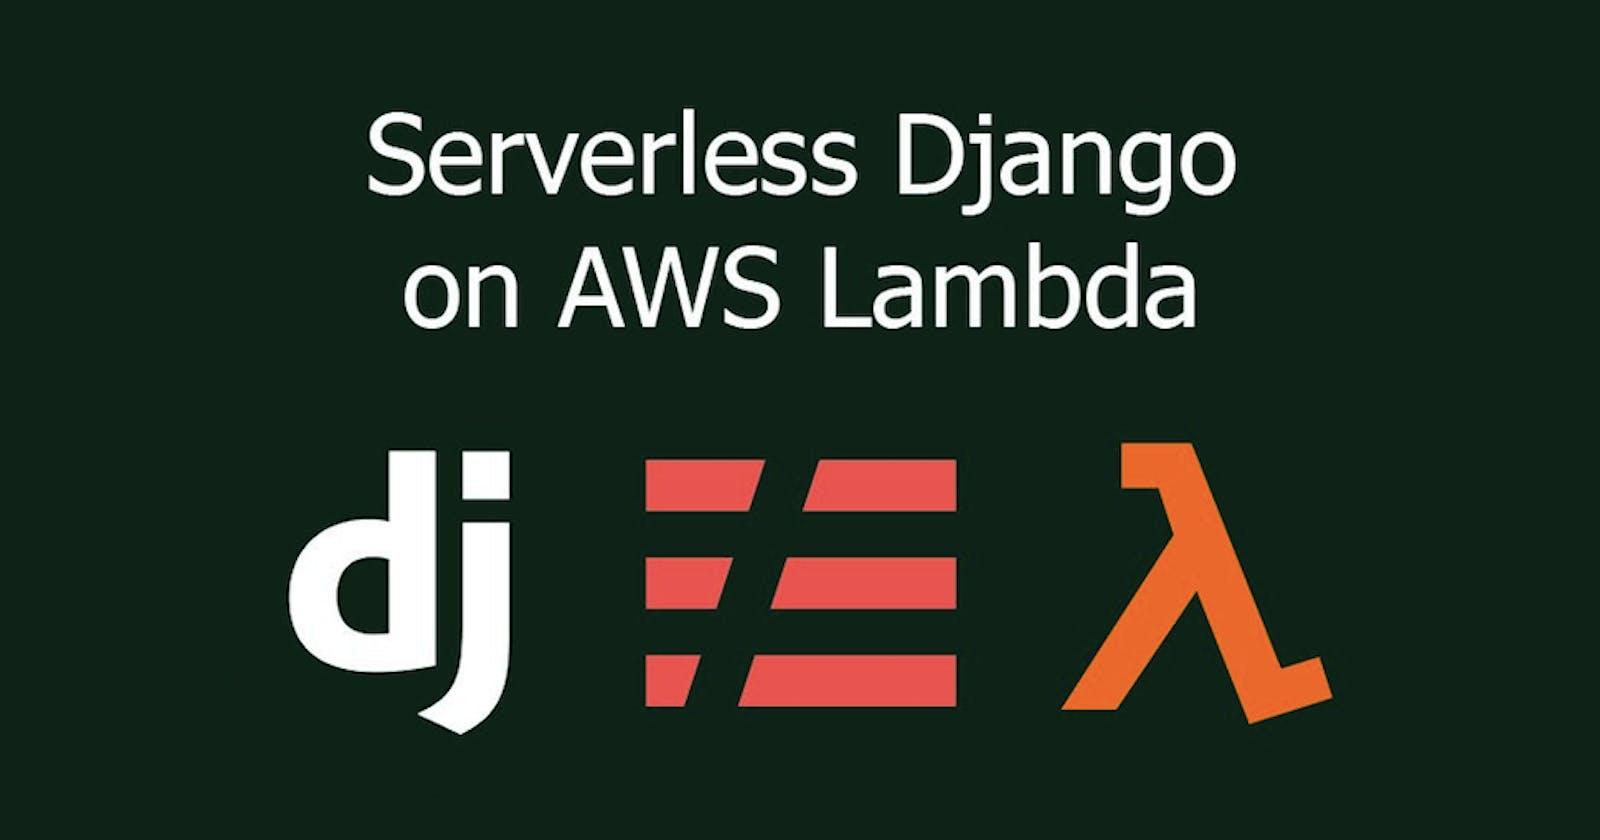 Deploying a Django project on AWS Lambda using Serverless (Part 1)